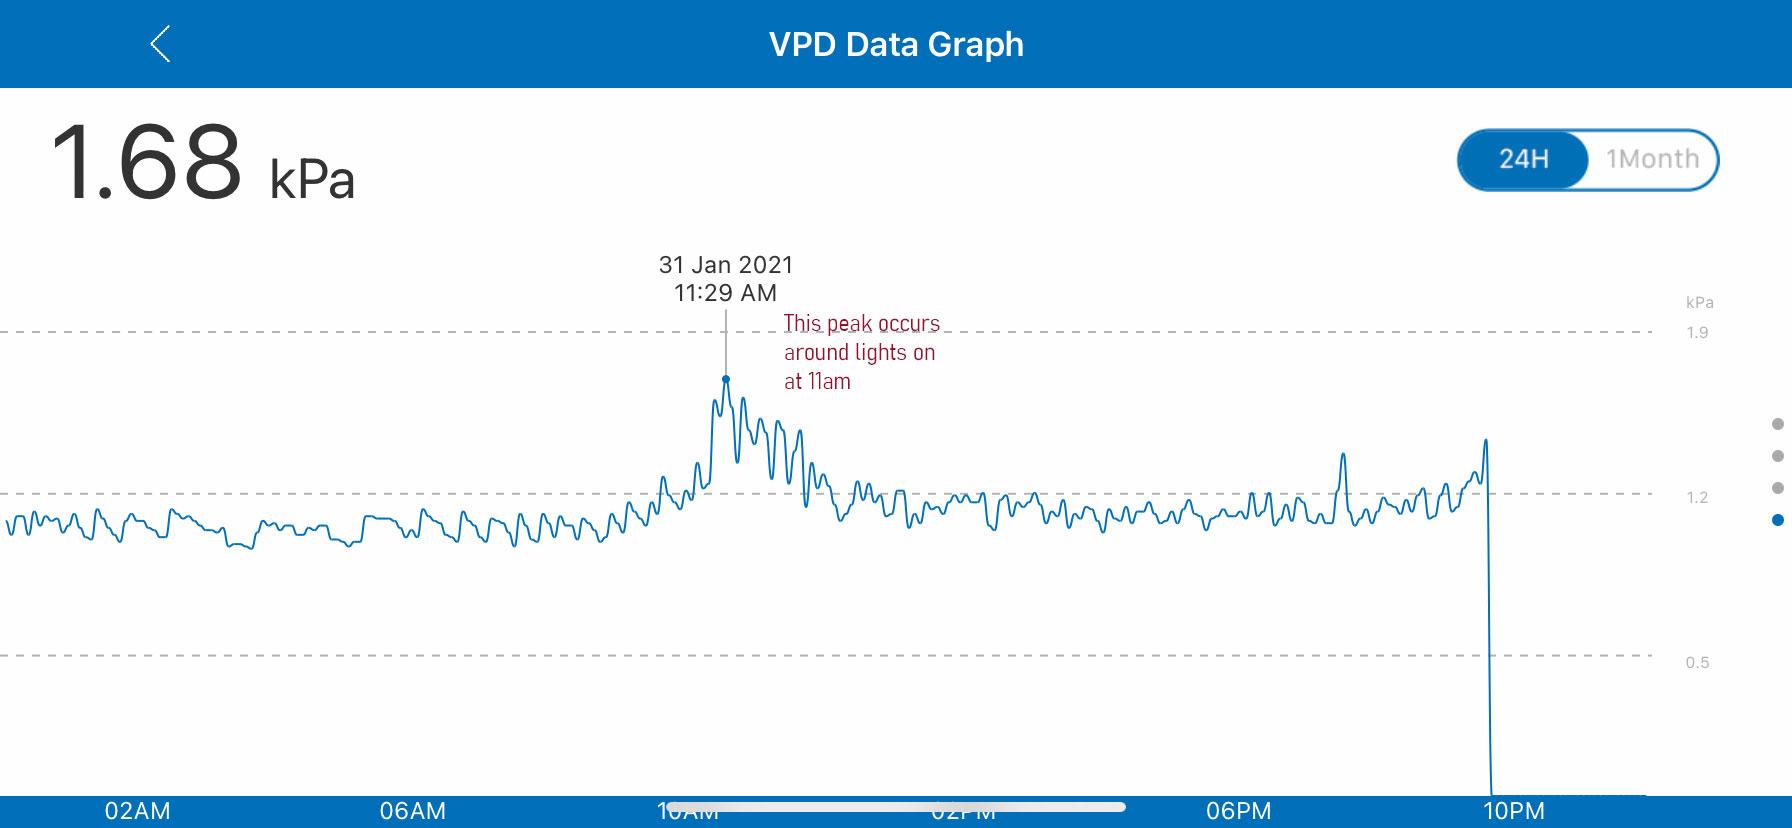 VPD_01312021.jpg